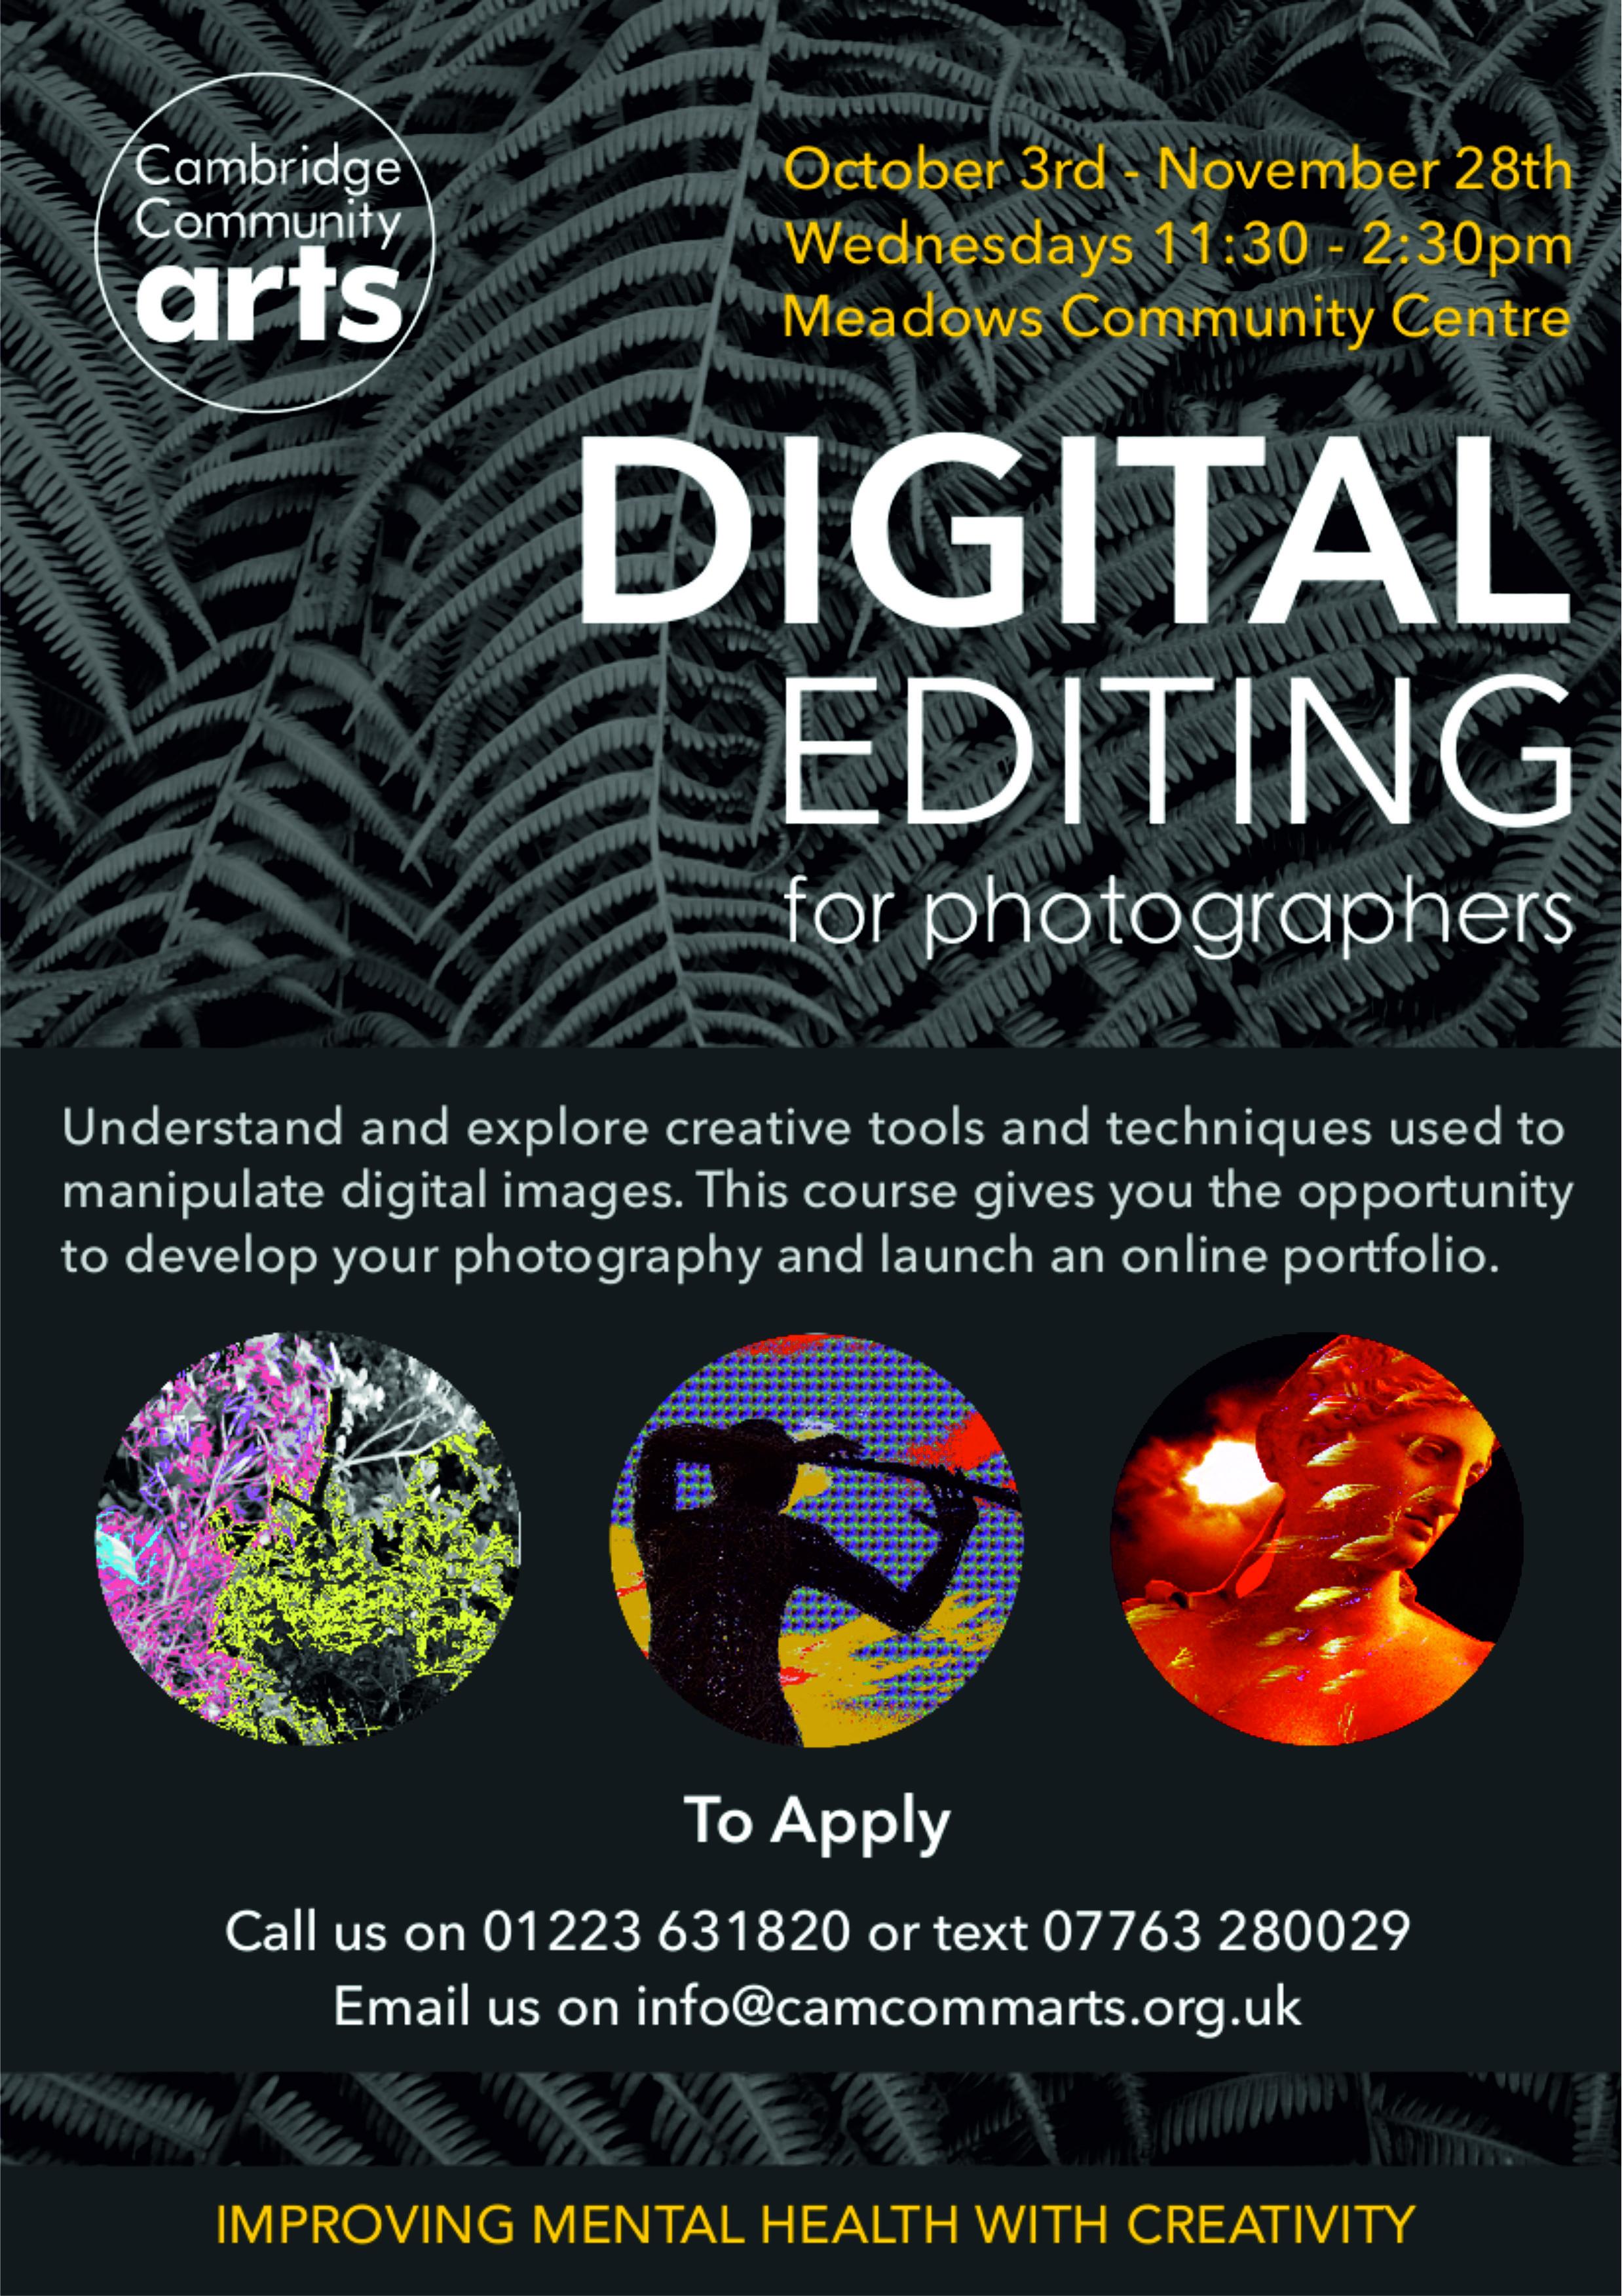 Digital Editing for Photographers Autumn 18